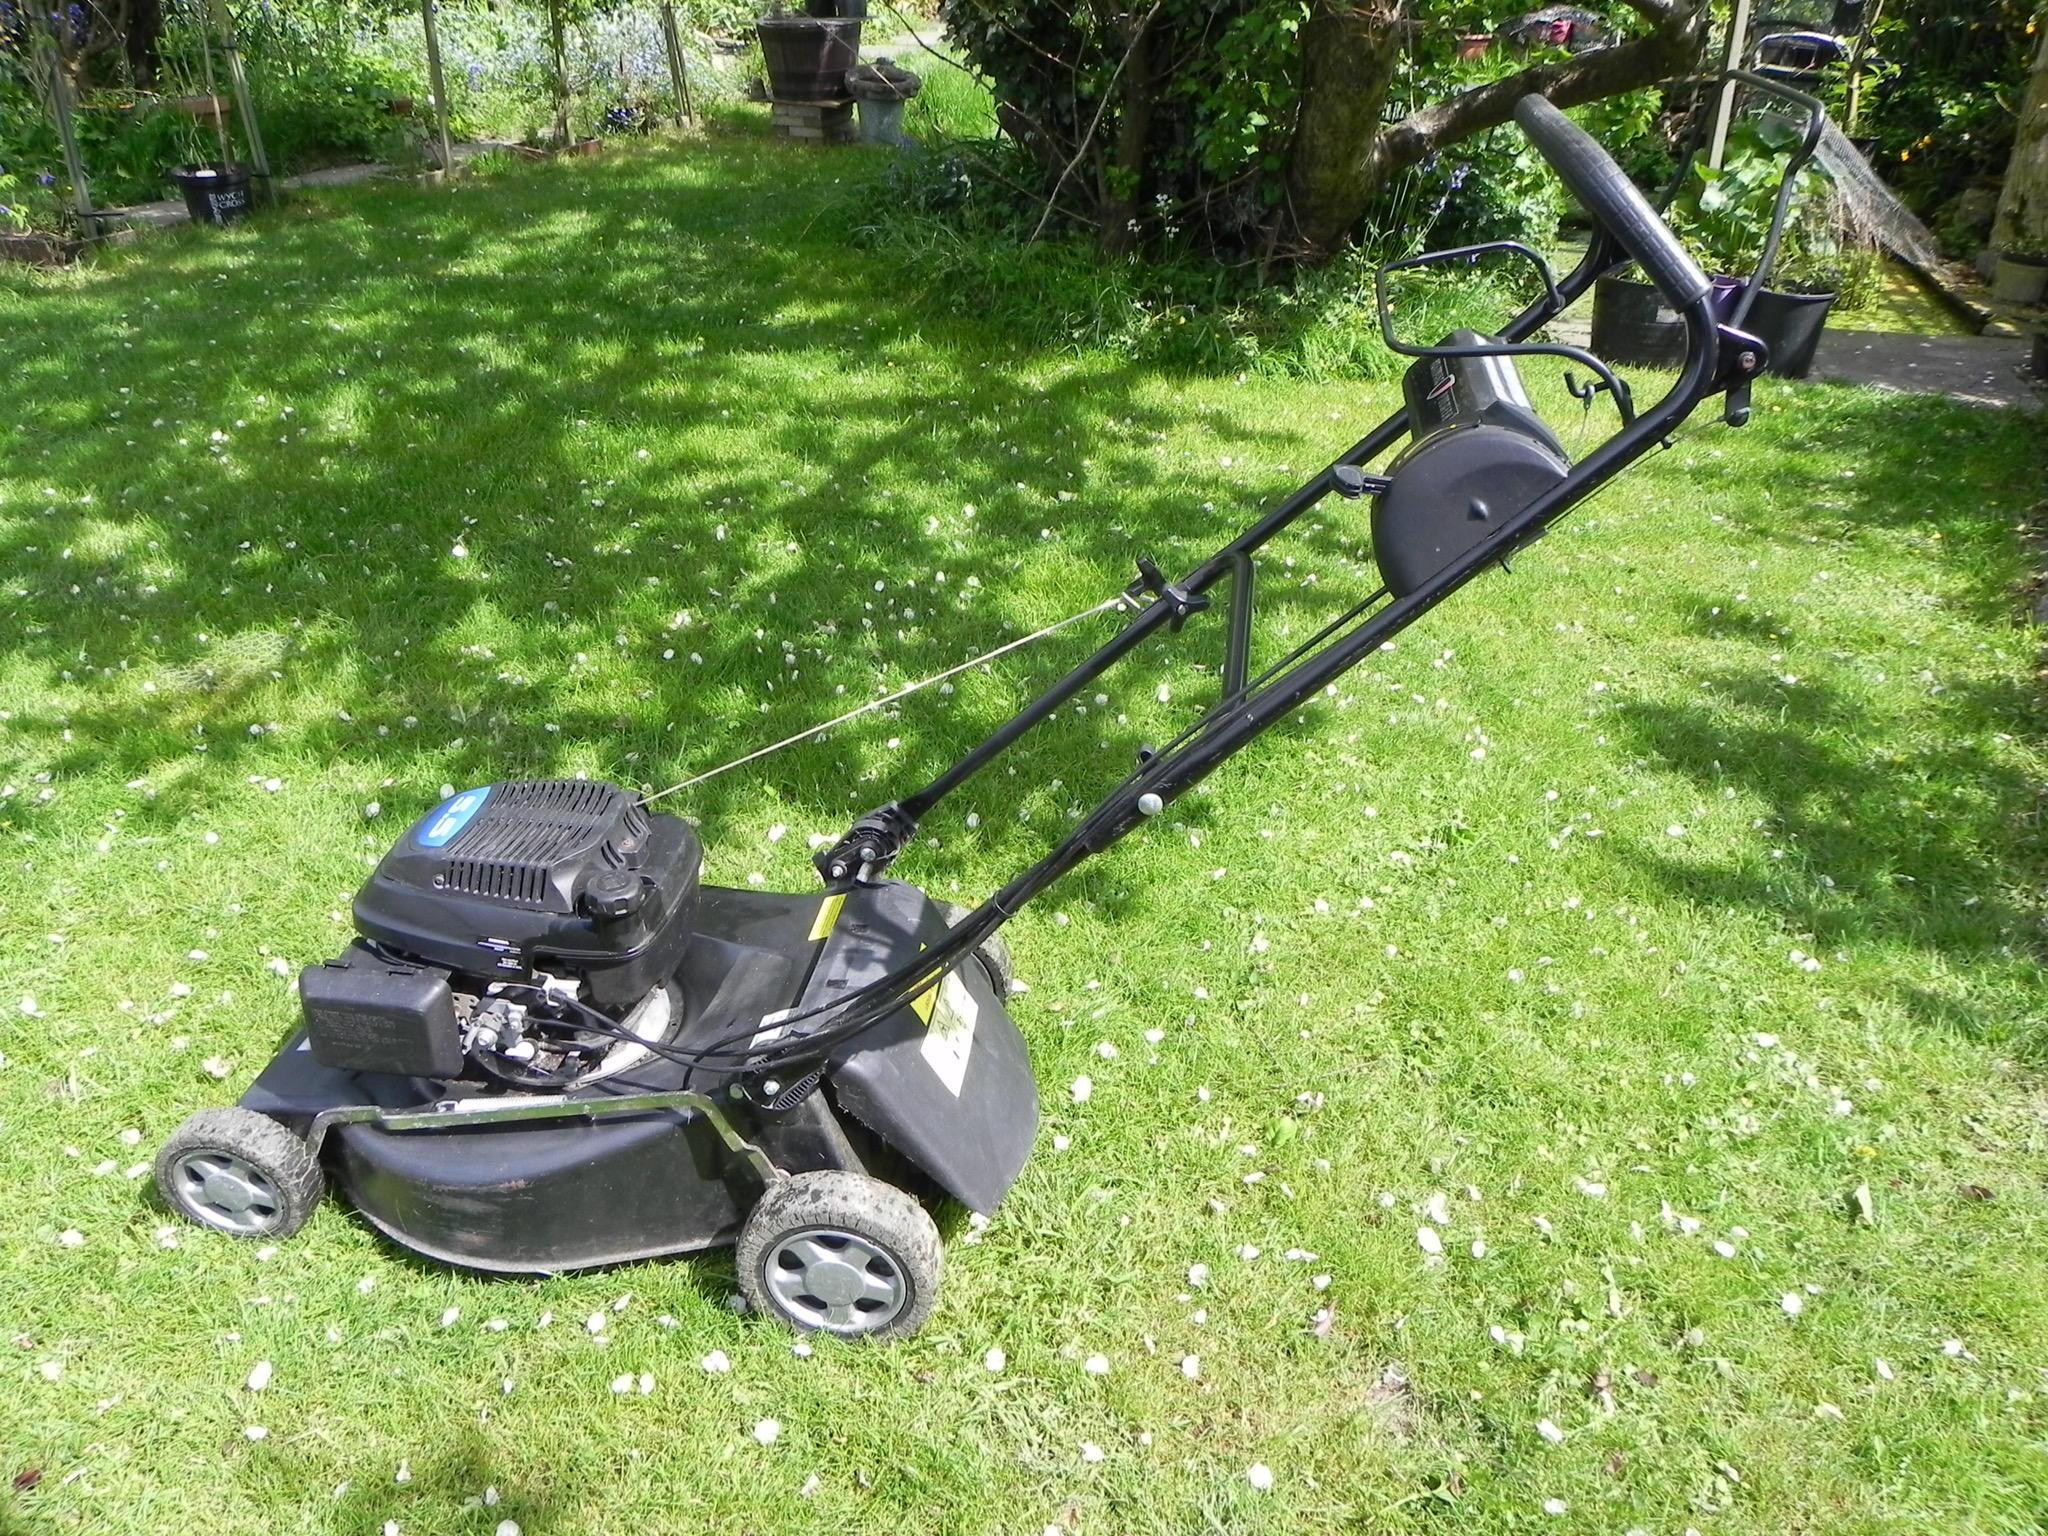 petrol lawn mower for sale essex